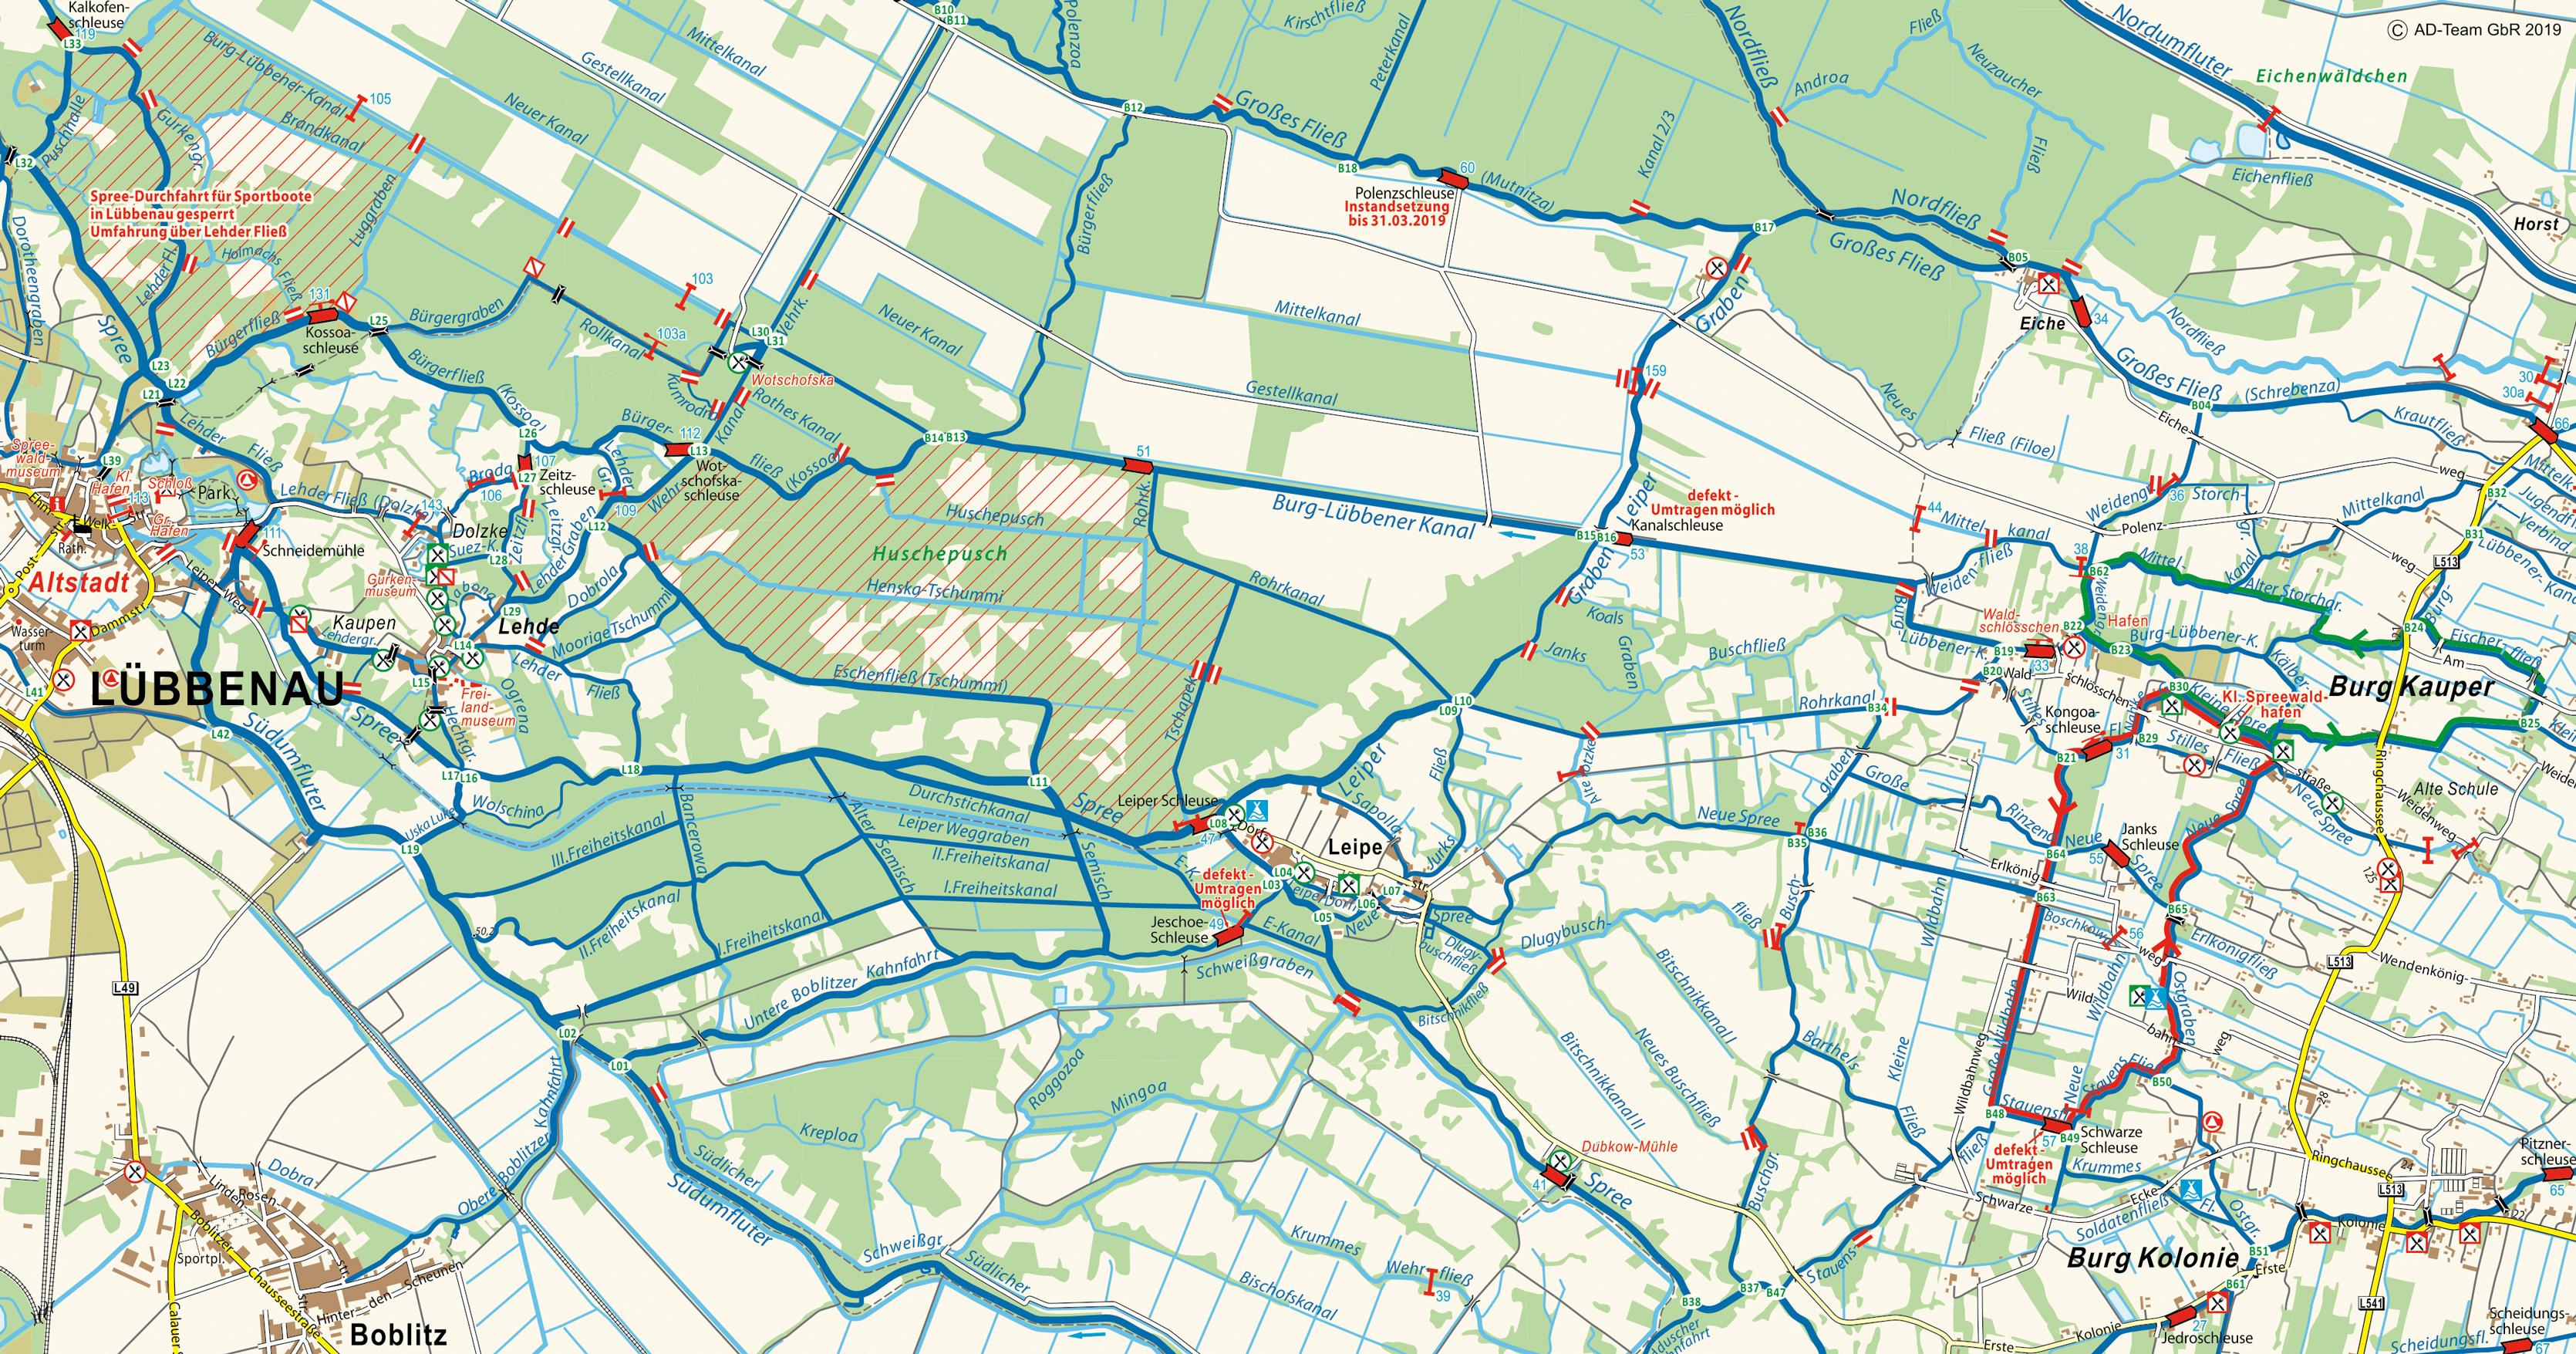 Karte Spreewald Lubbenau.Kleiner Spreewaldhafen Burg